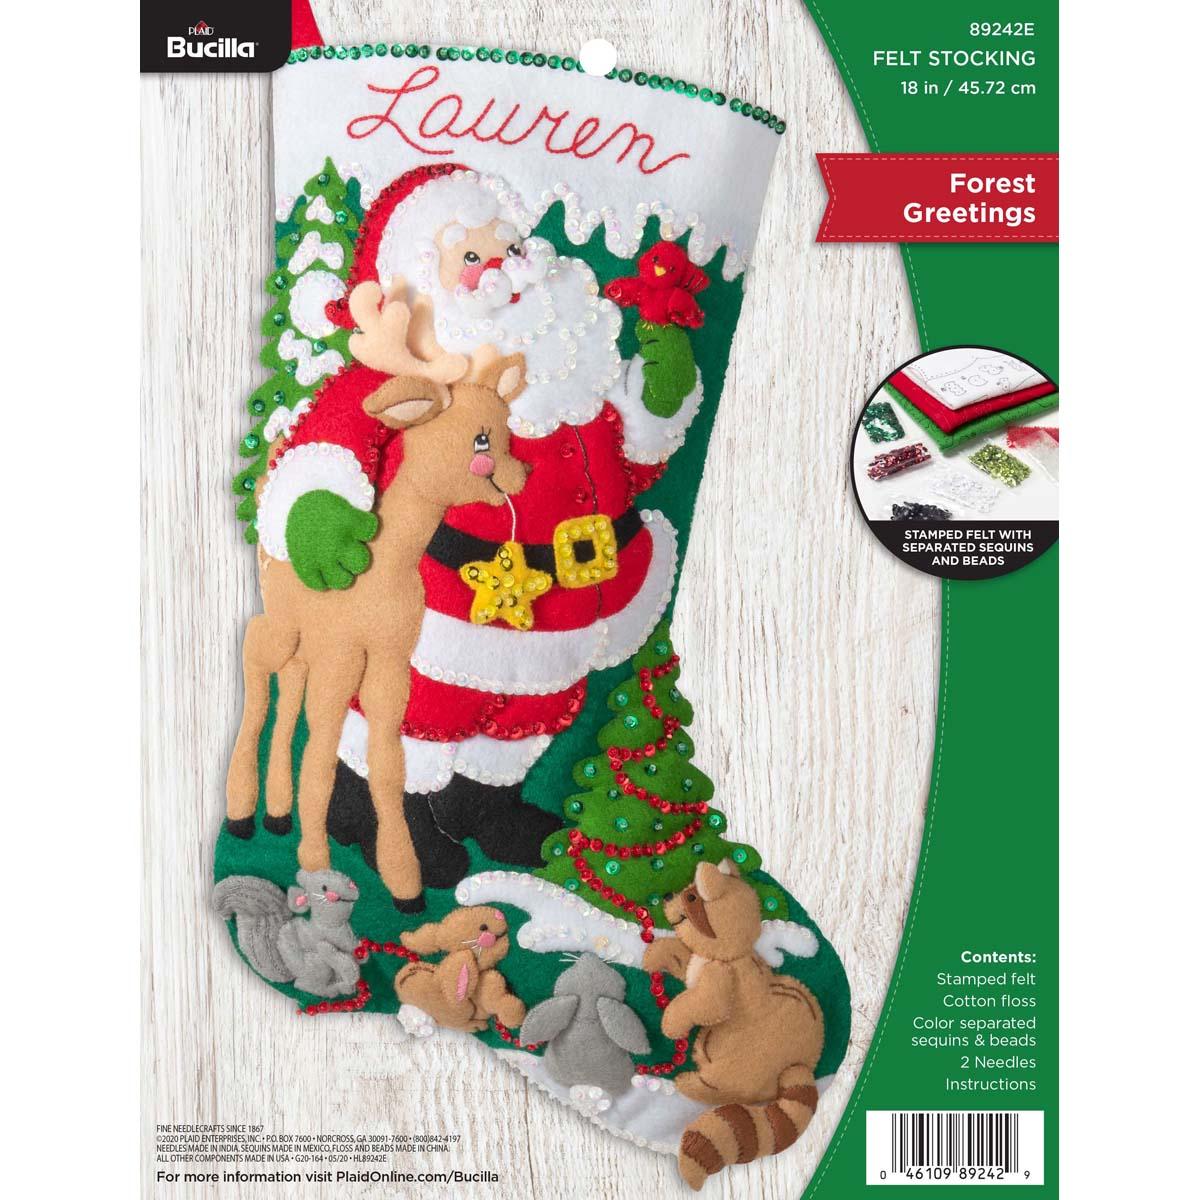 Bucilla ® Seasonal - Felt - Stocking Kits - Forest Greetings - 89242E